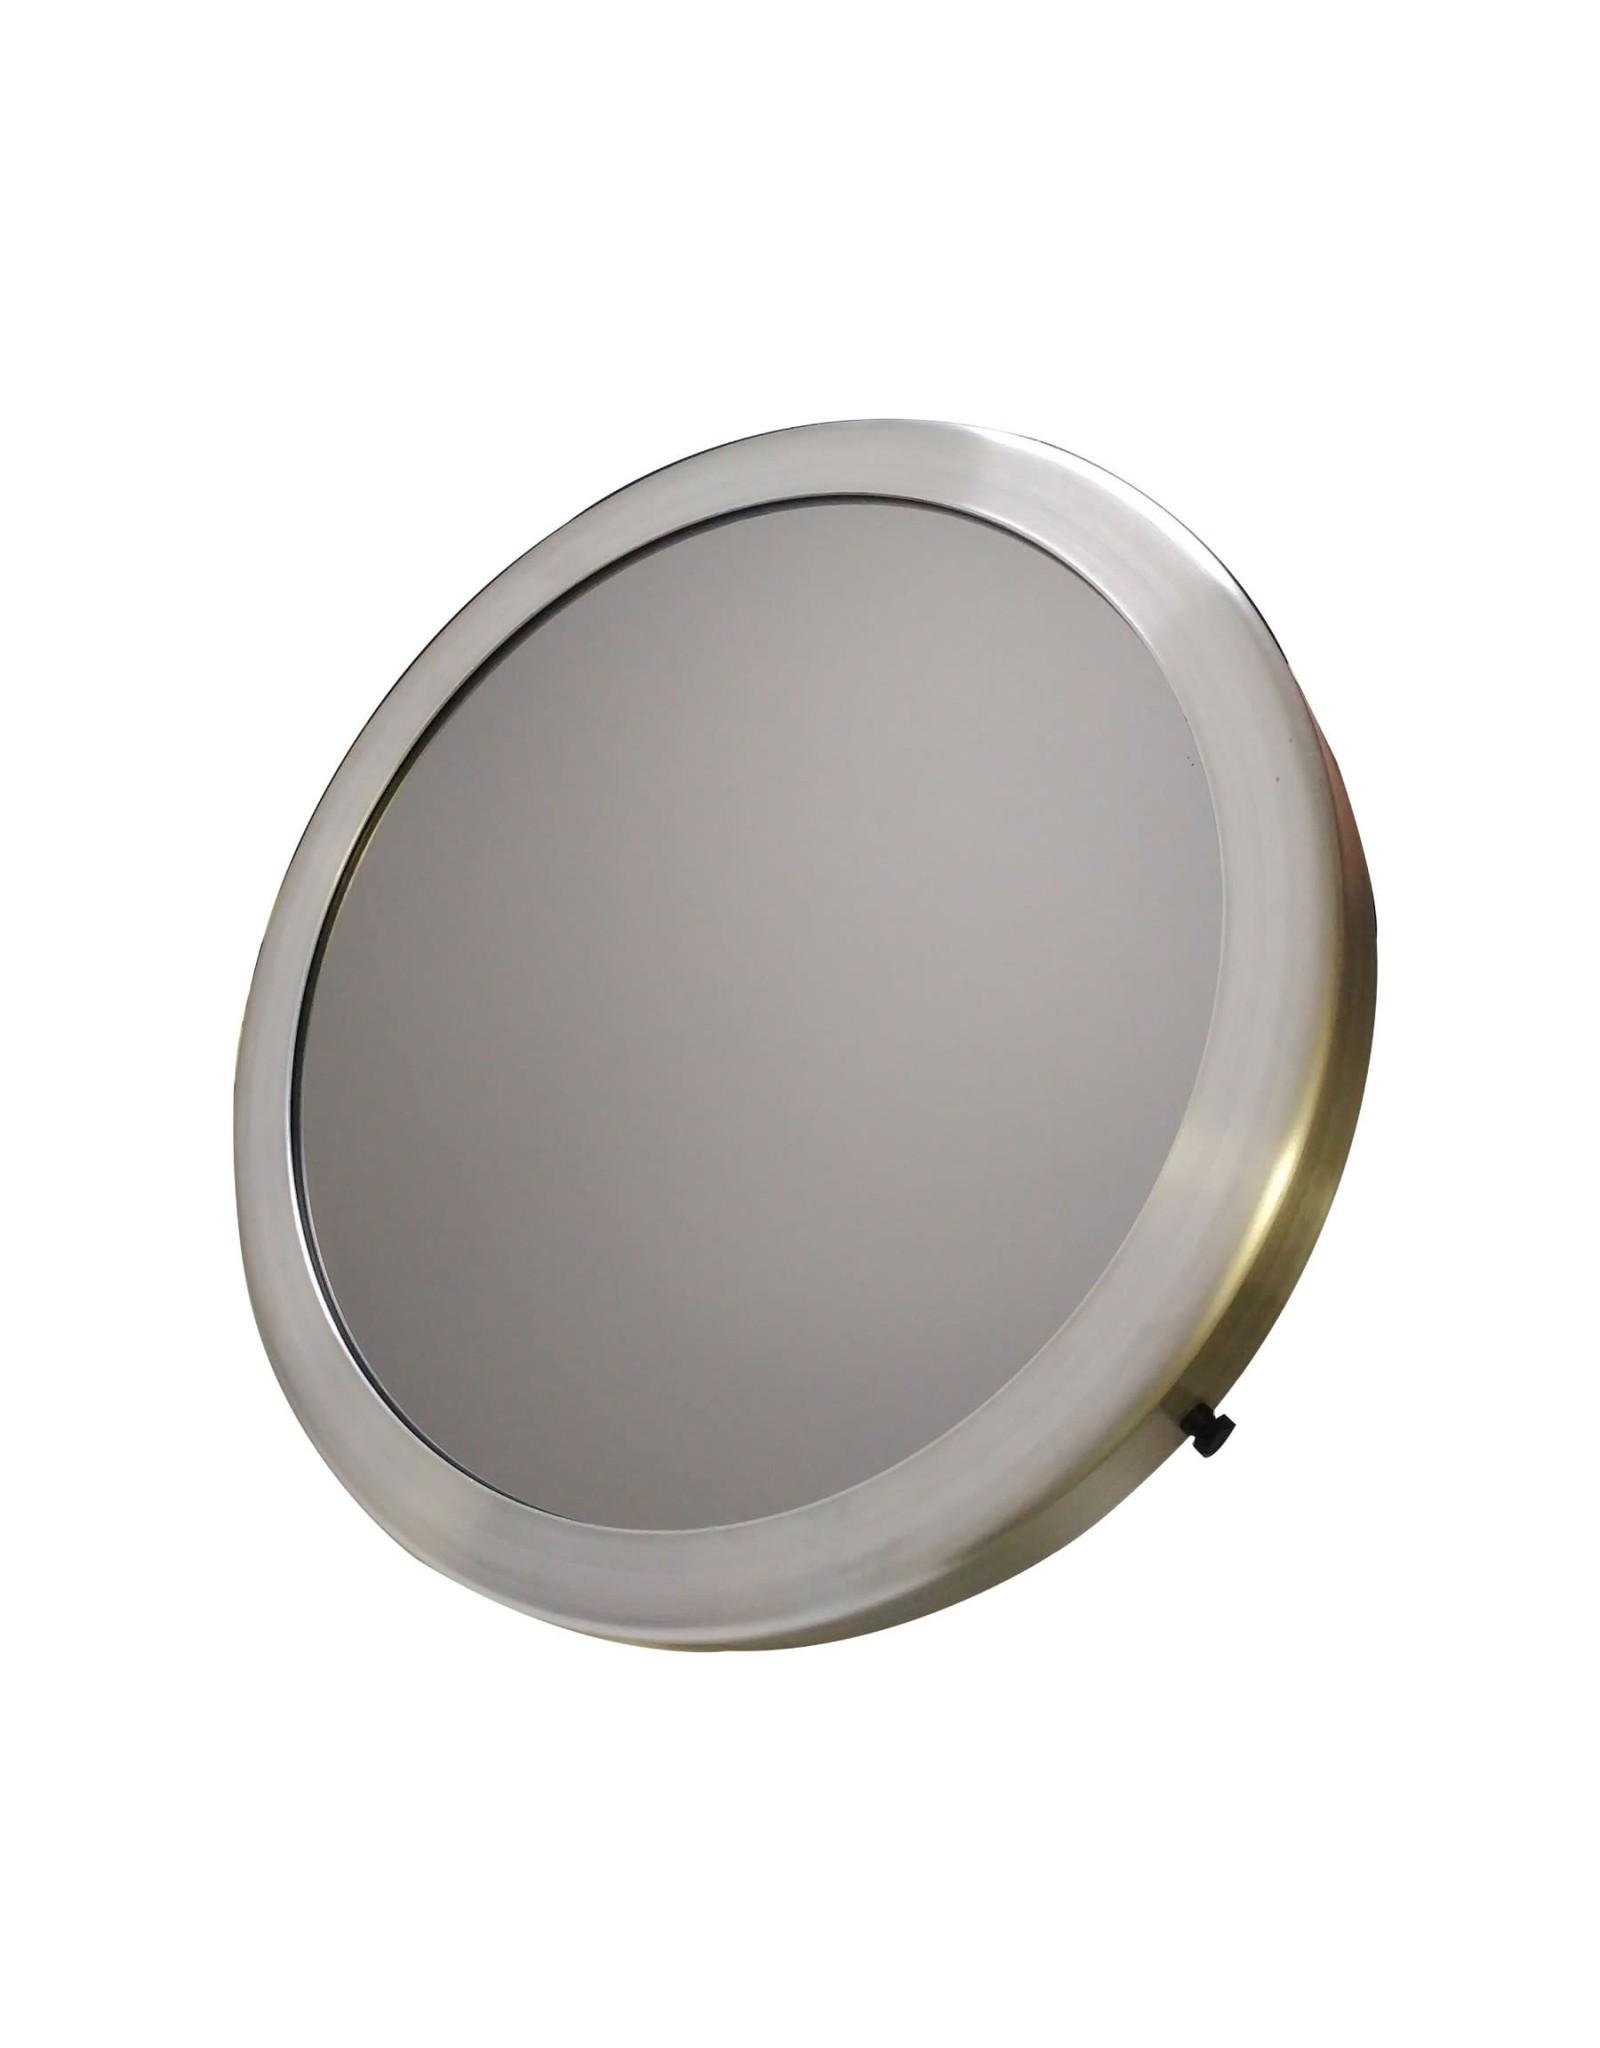 Meade Meade Glass White-Light Solar Filter #600 (ID 152mm)